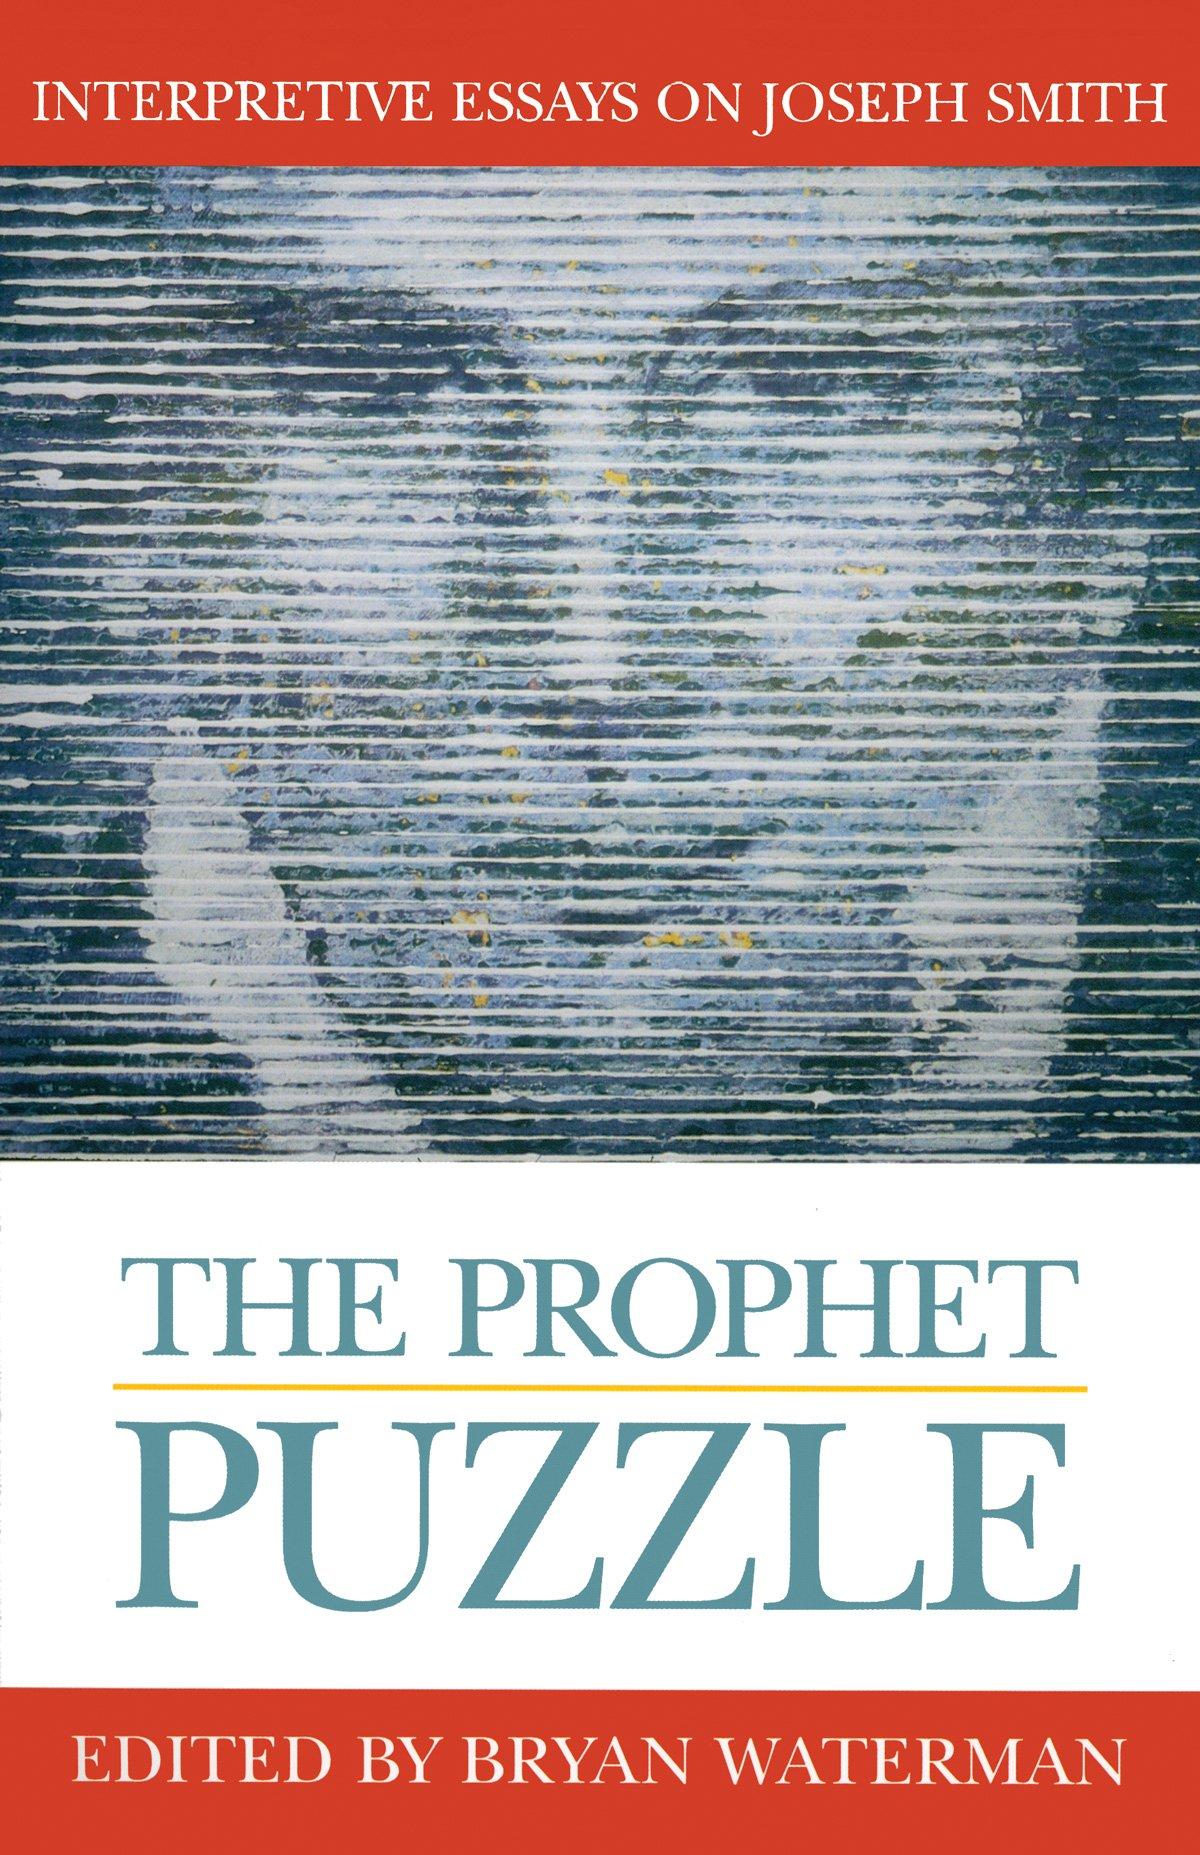 the prophet puzzle interpretive essays on joseph smith essays on the prophet puzzle interpretive essays on joseph smith essays on mormonism series bryan waterman 9781560851219 amazon com books